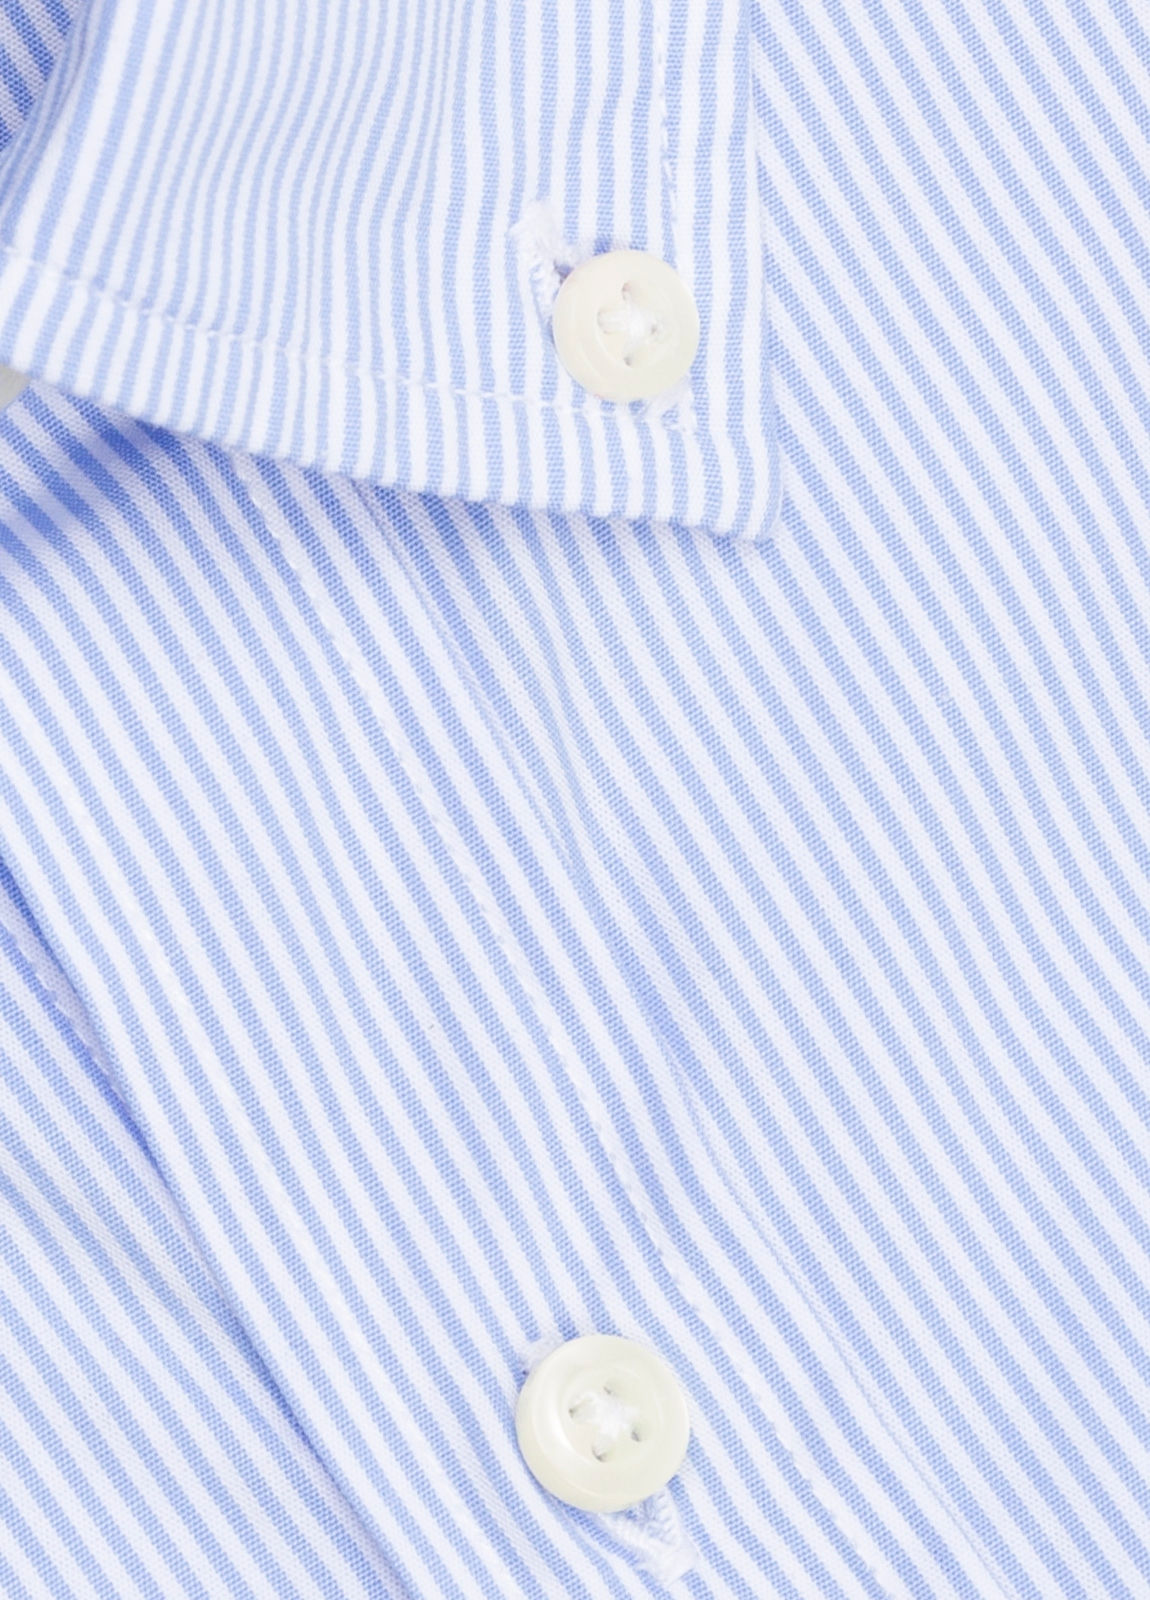 Camisa M/Corta sport FUREST COLECCIÓN Regular FIT raya celeste - Ítem1